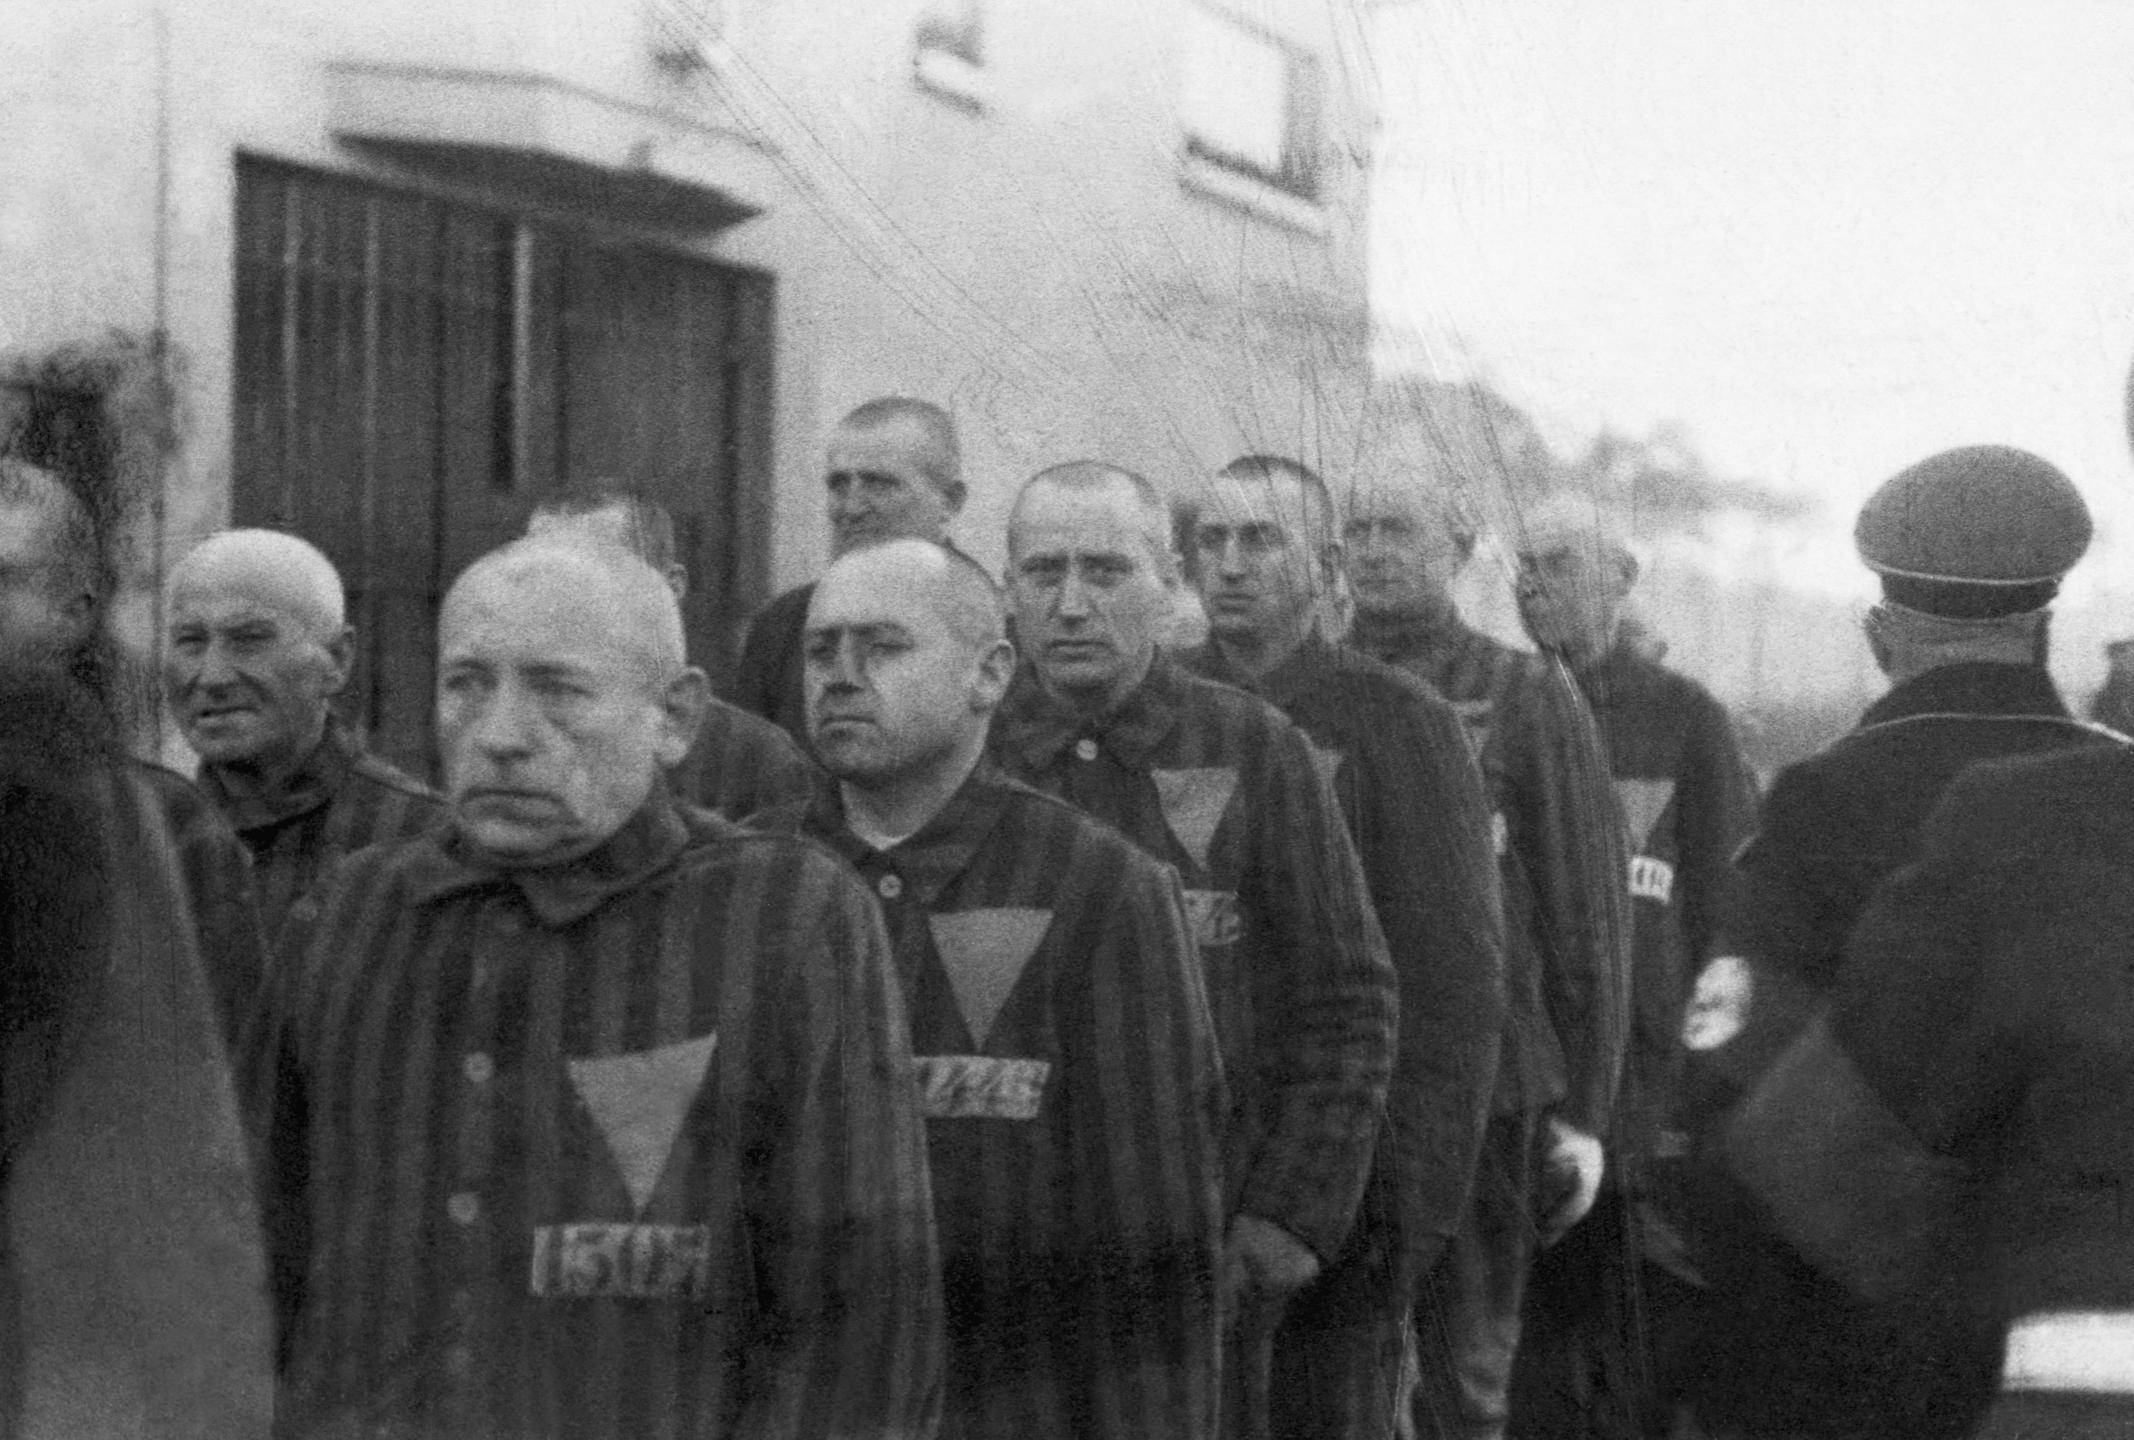 nazisme, transmisogynie, homophobie, antisémitisme